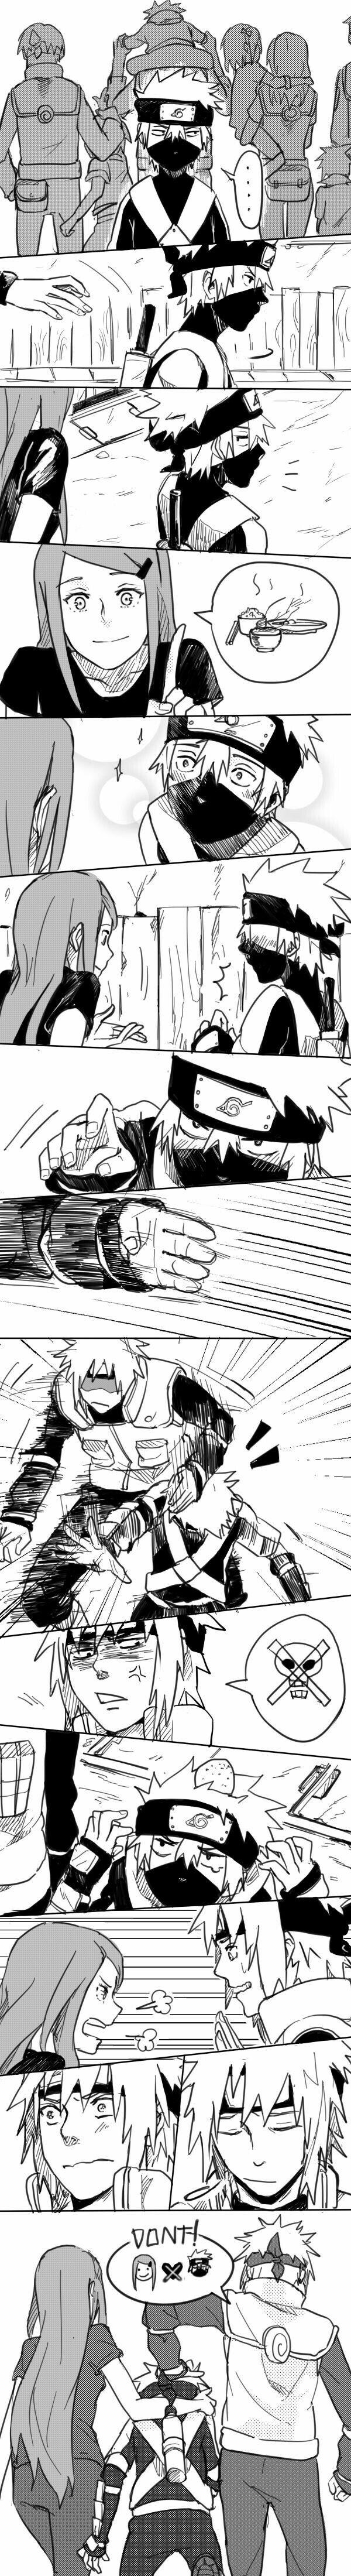 Minato, Kushina, Kakashi, young, childhood, funny, text, comic; Naruto